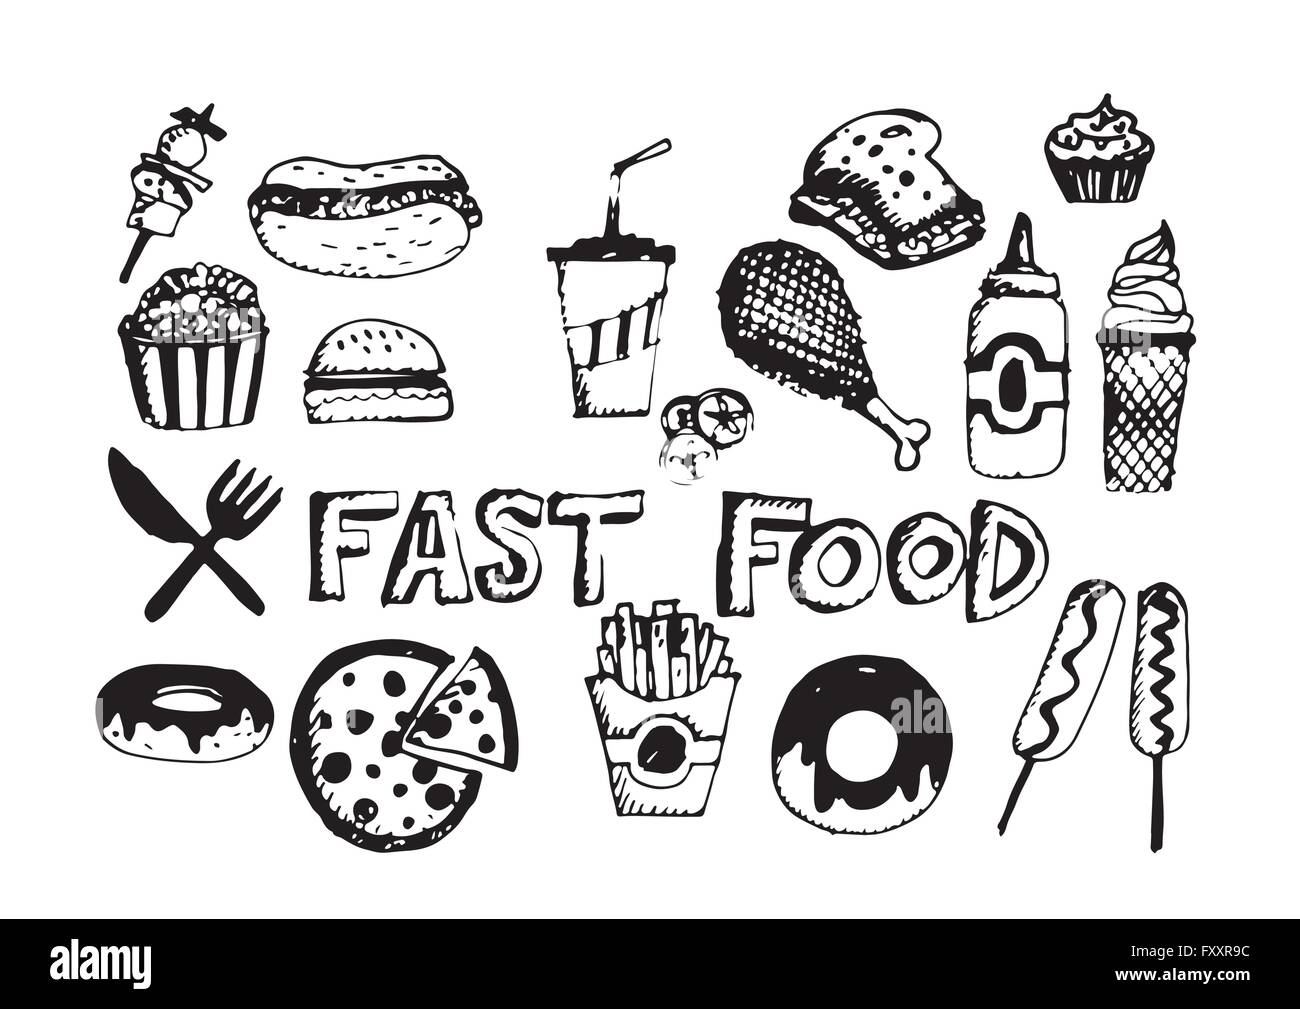 Fast Food Icons Vector Symbols Stock Vector Art Illustration